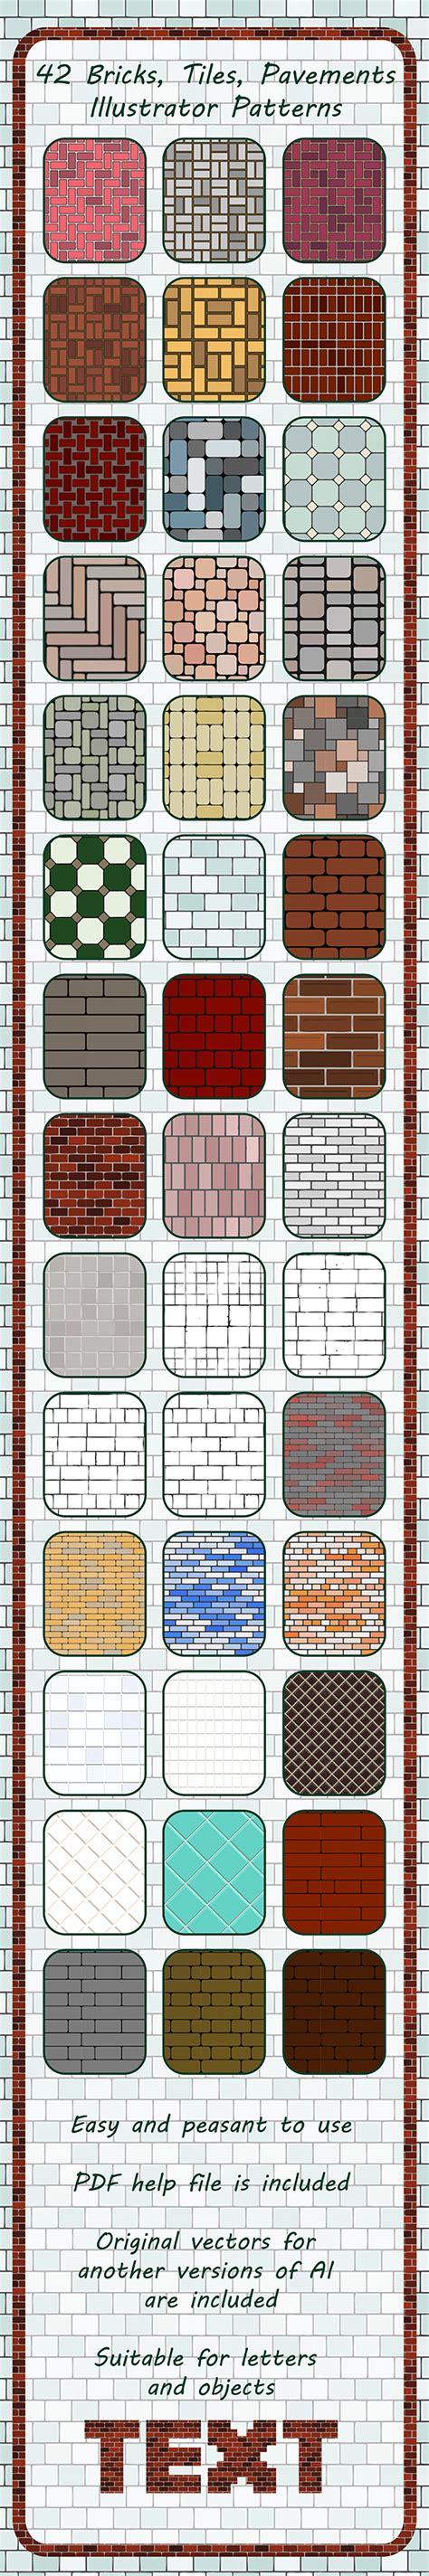 adobe illustrator brick pattern 42 bricks tiles pavements seamless adobe illustrator